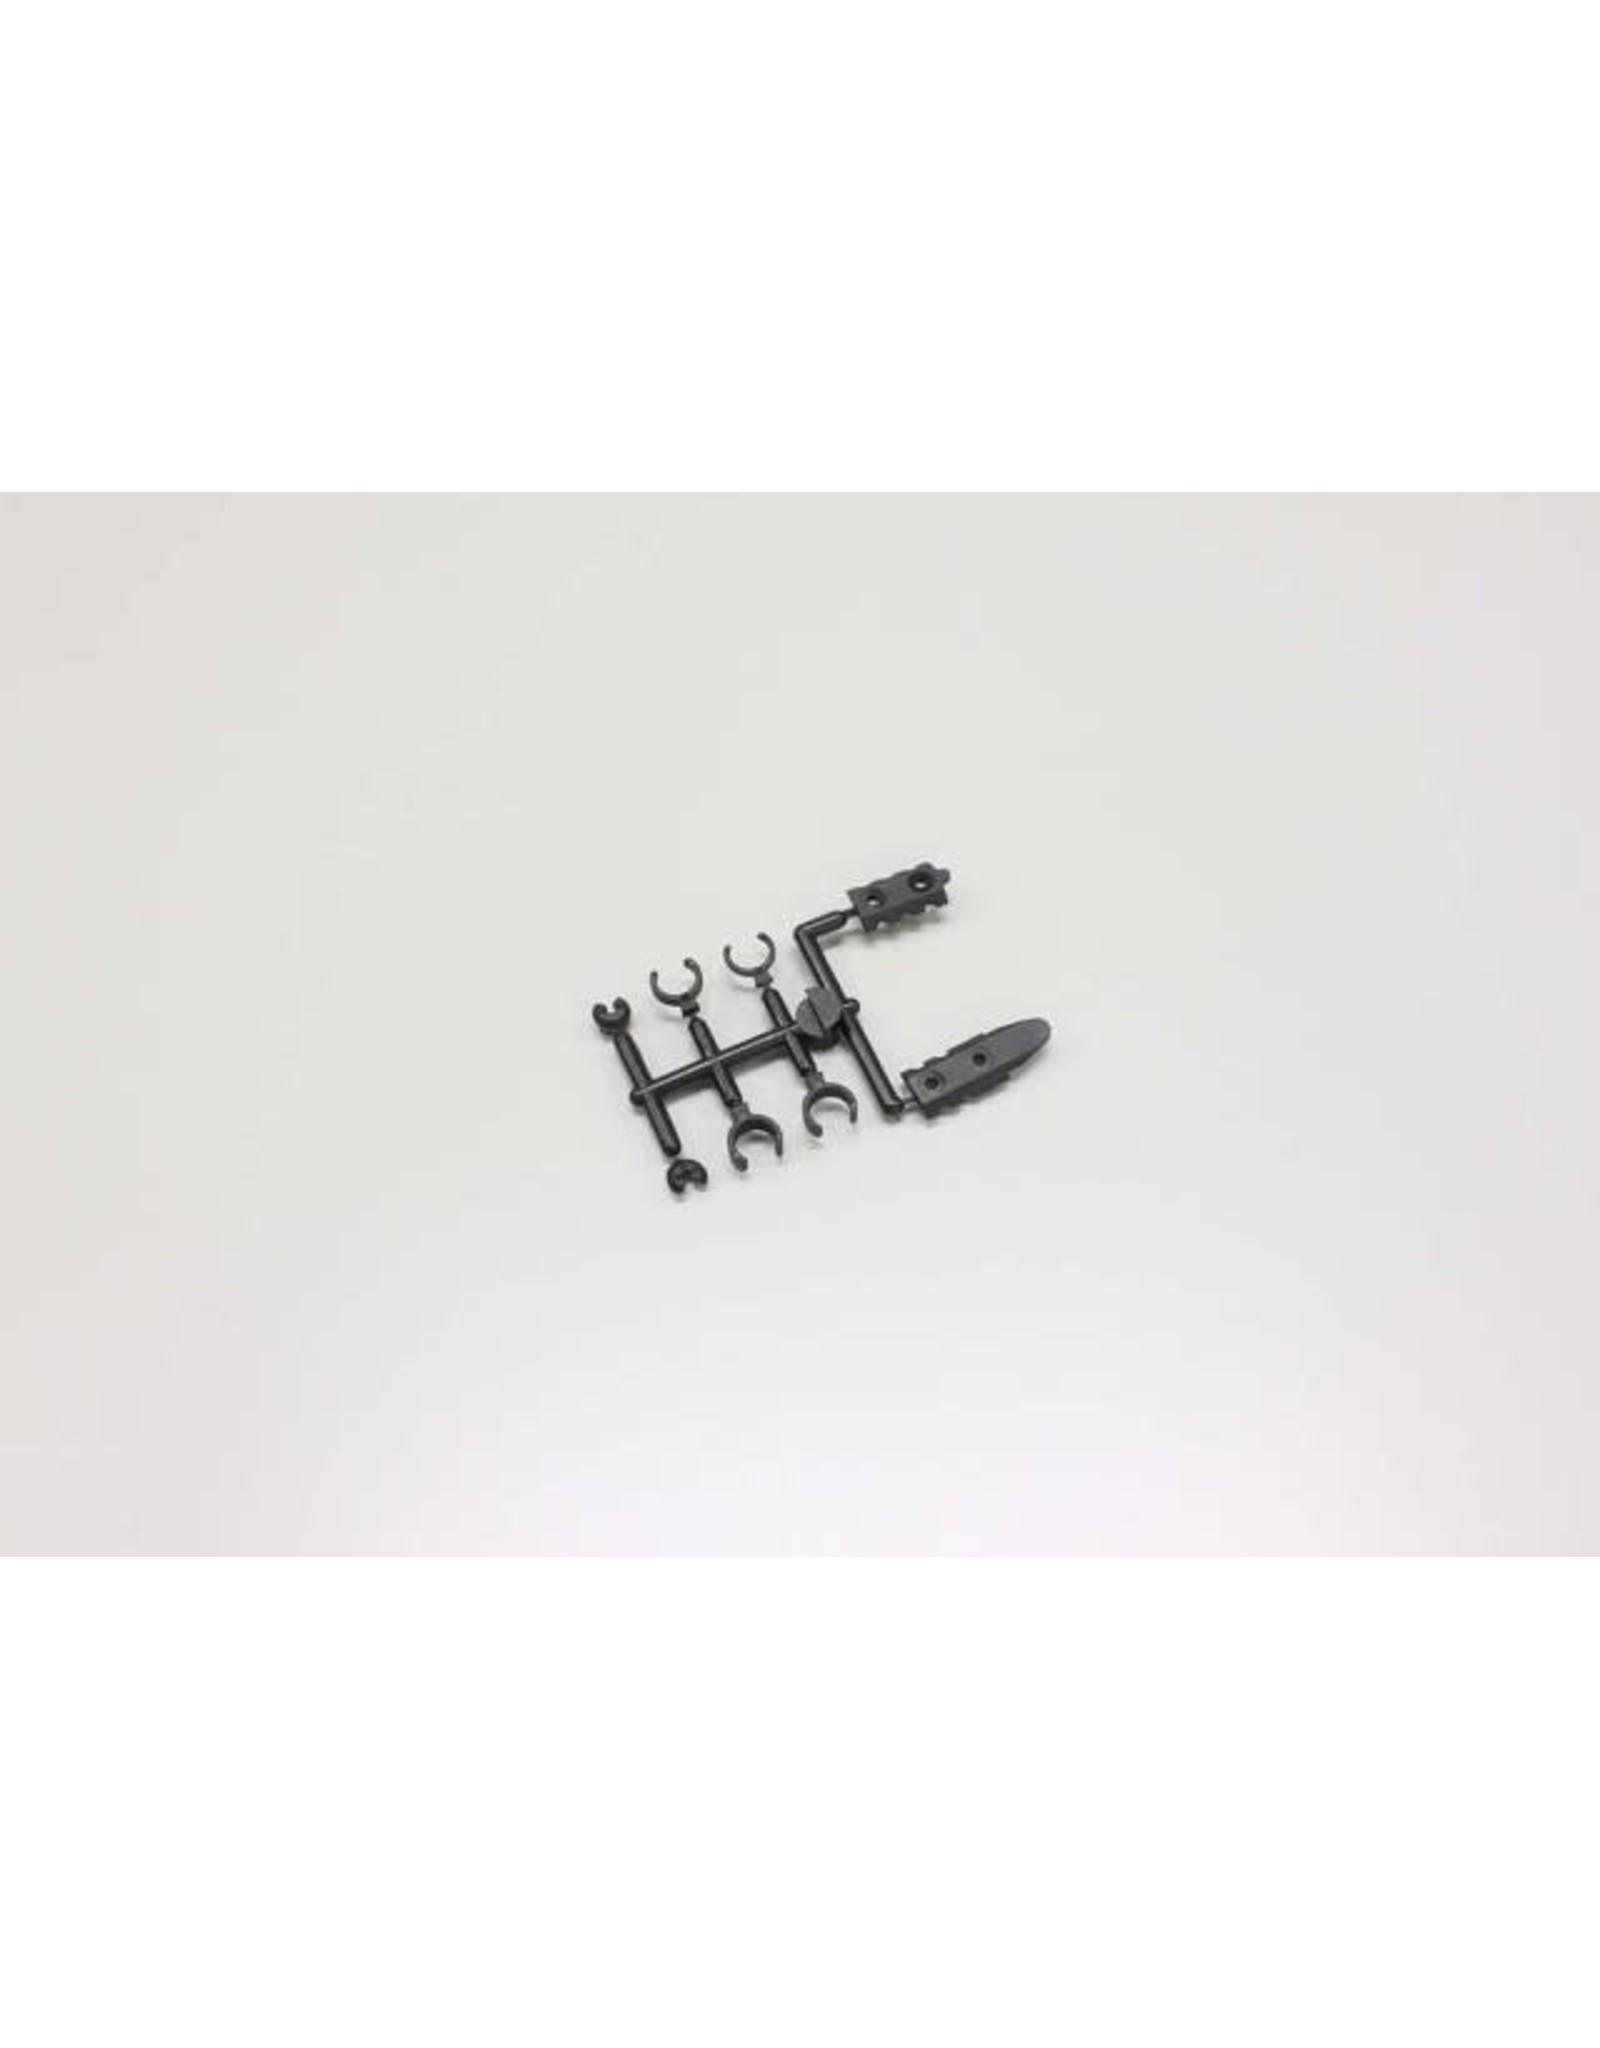 Kyosho Circle Clip & Spacer set (mr-03)MZW414